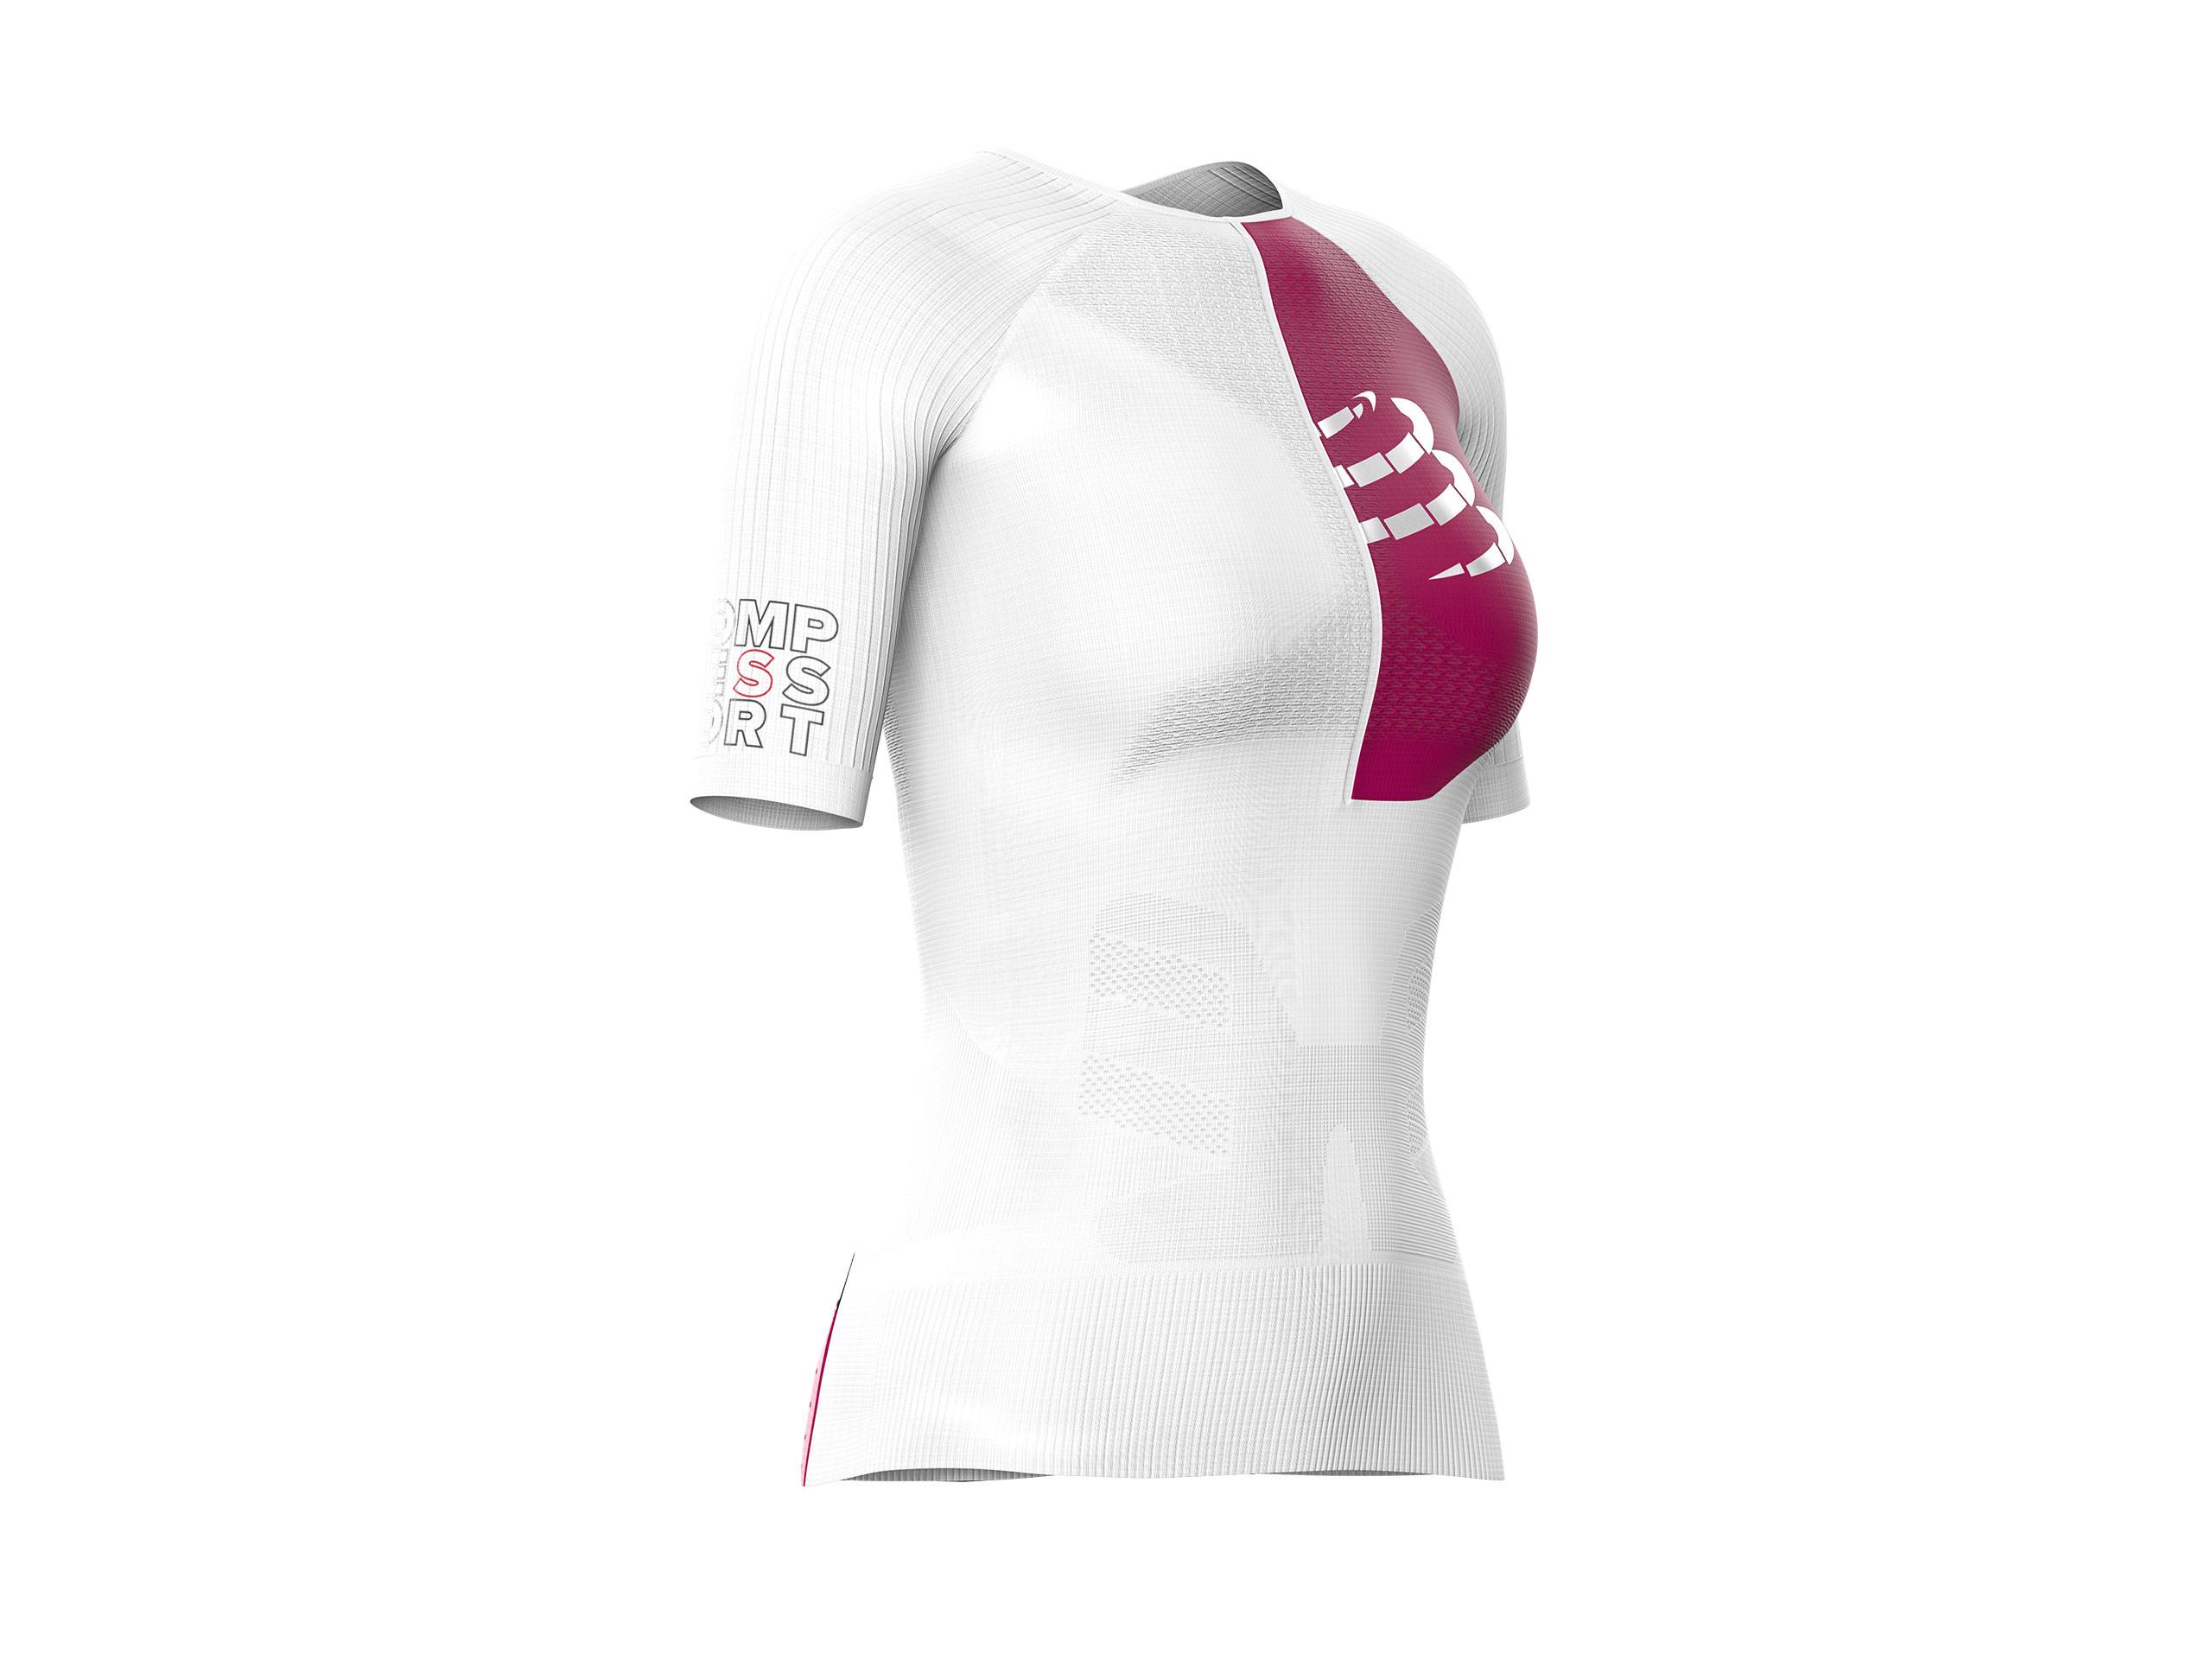 Camiseta Aero MC postural para triatlón M blanca